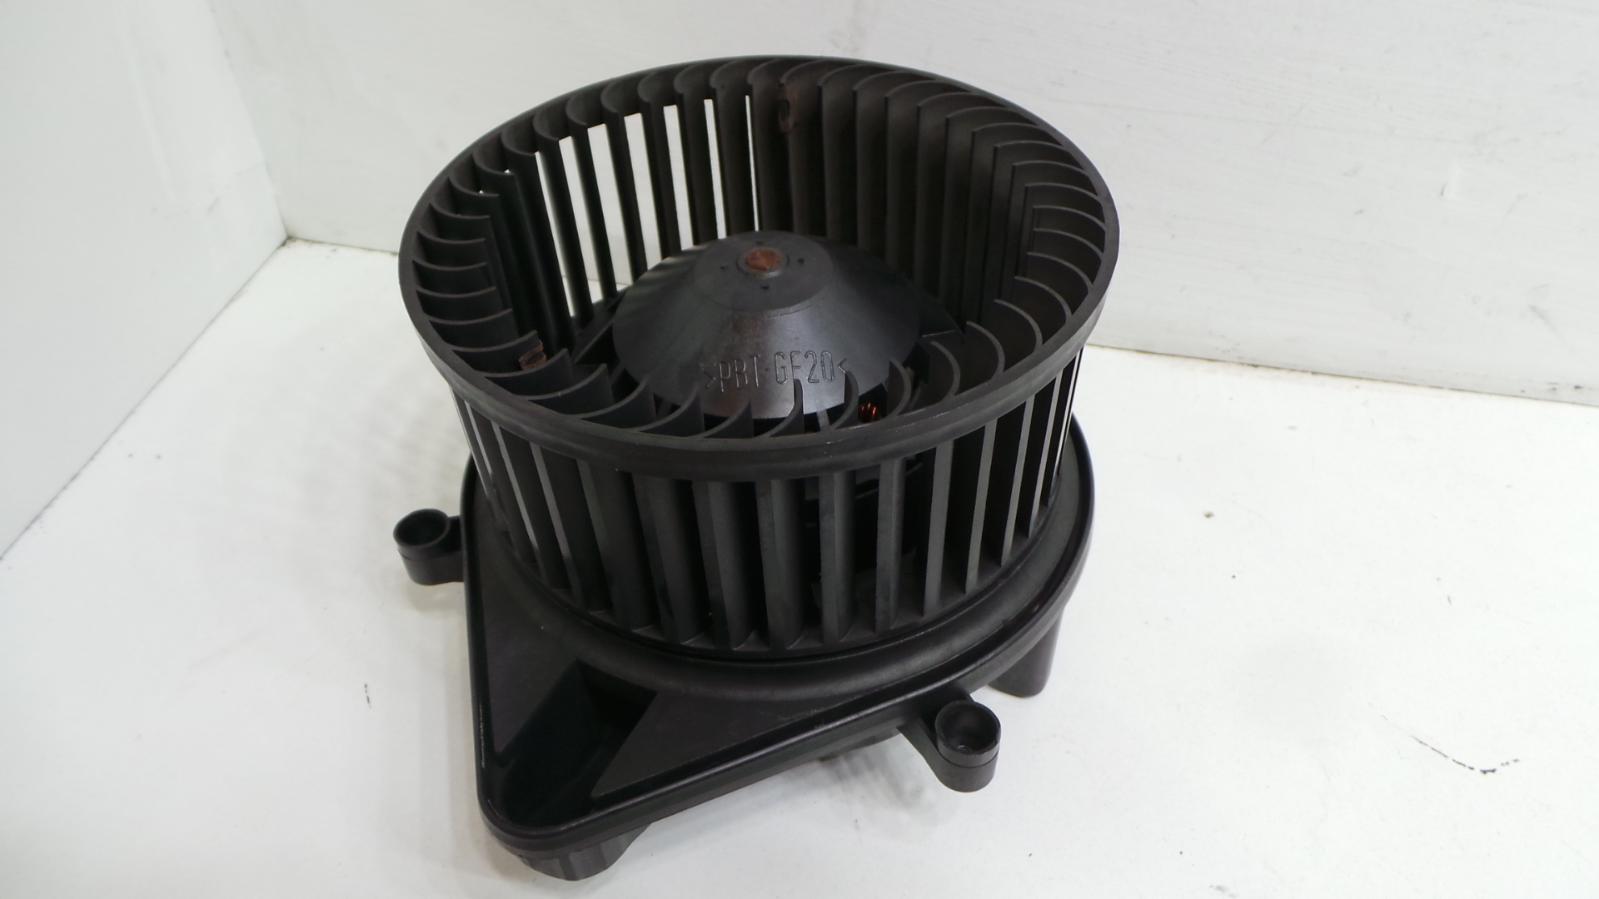 Service manual repair ac heater fan motor on a 2006 for Nissan frontier blower motor not working